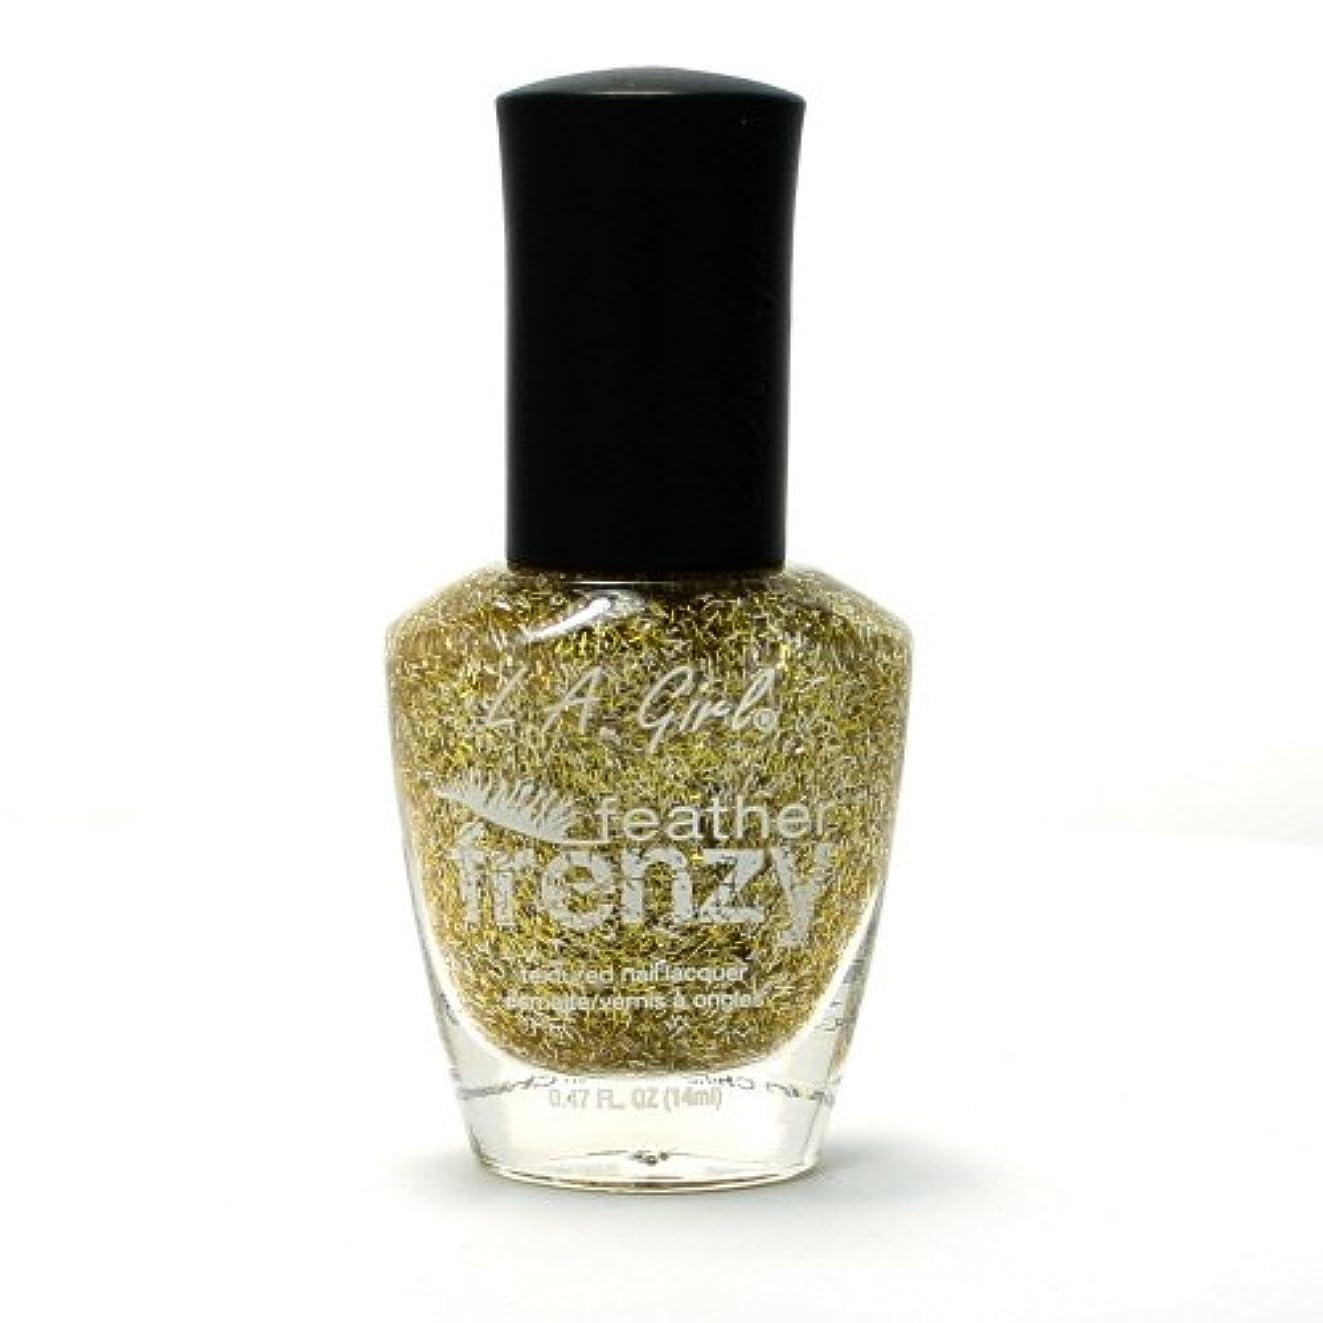 LA GIRL Feather Frenzy Nail Polish - Canary (並行輸入品)